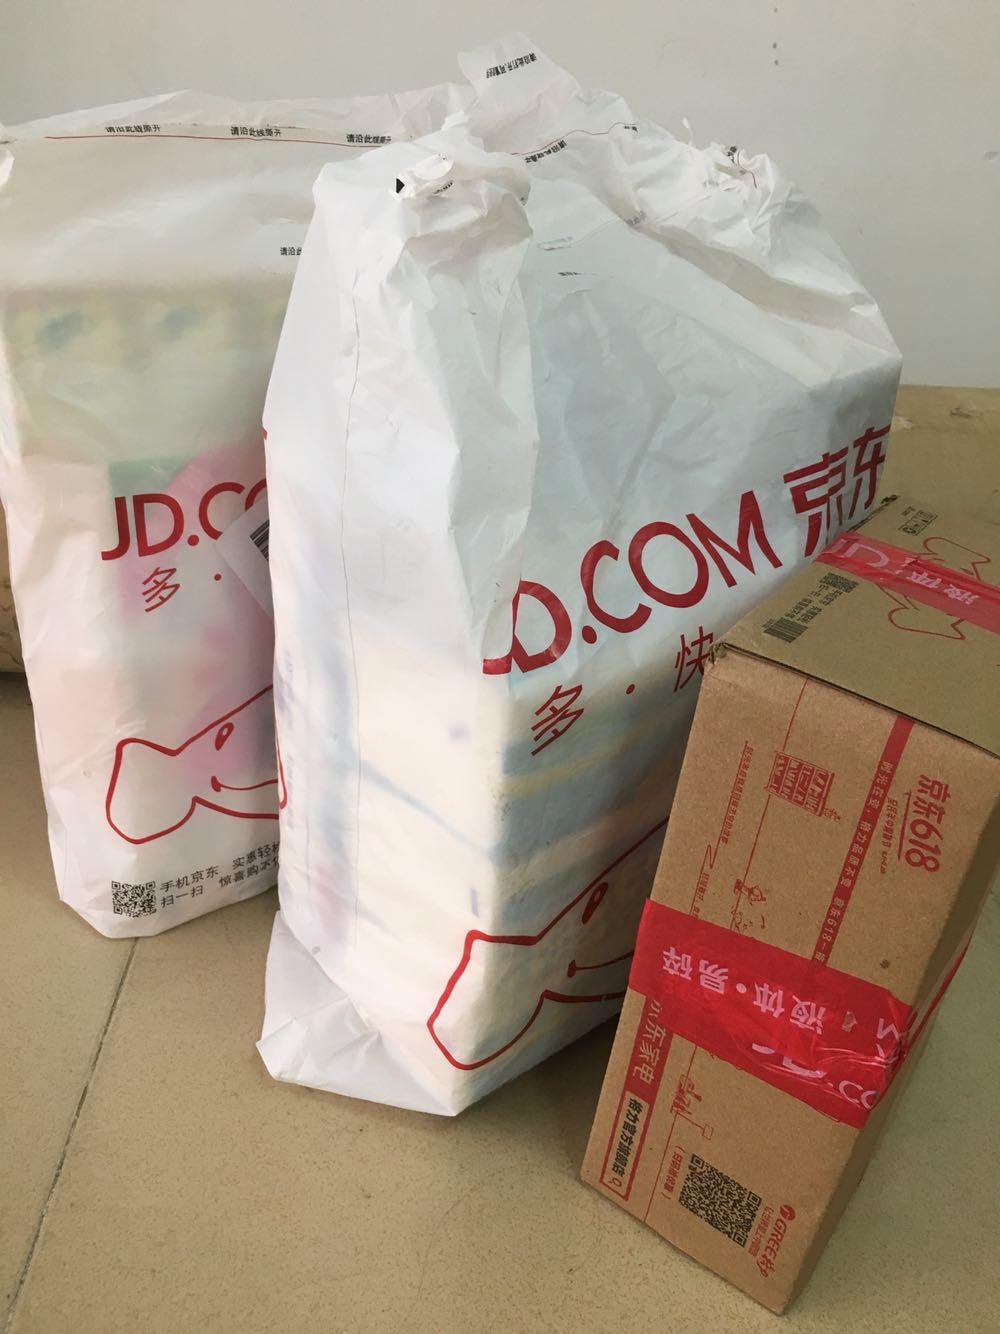 jordans release 2014 january 00284752 store